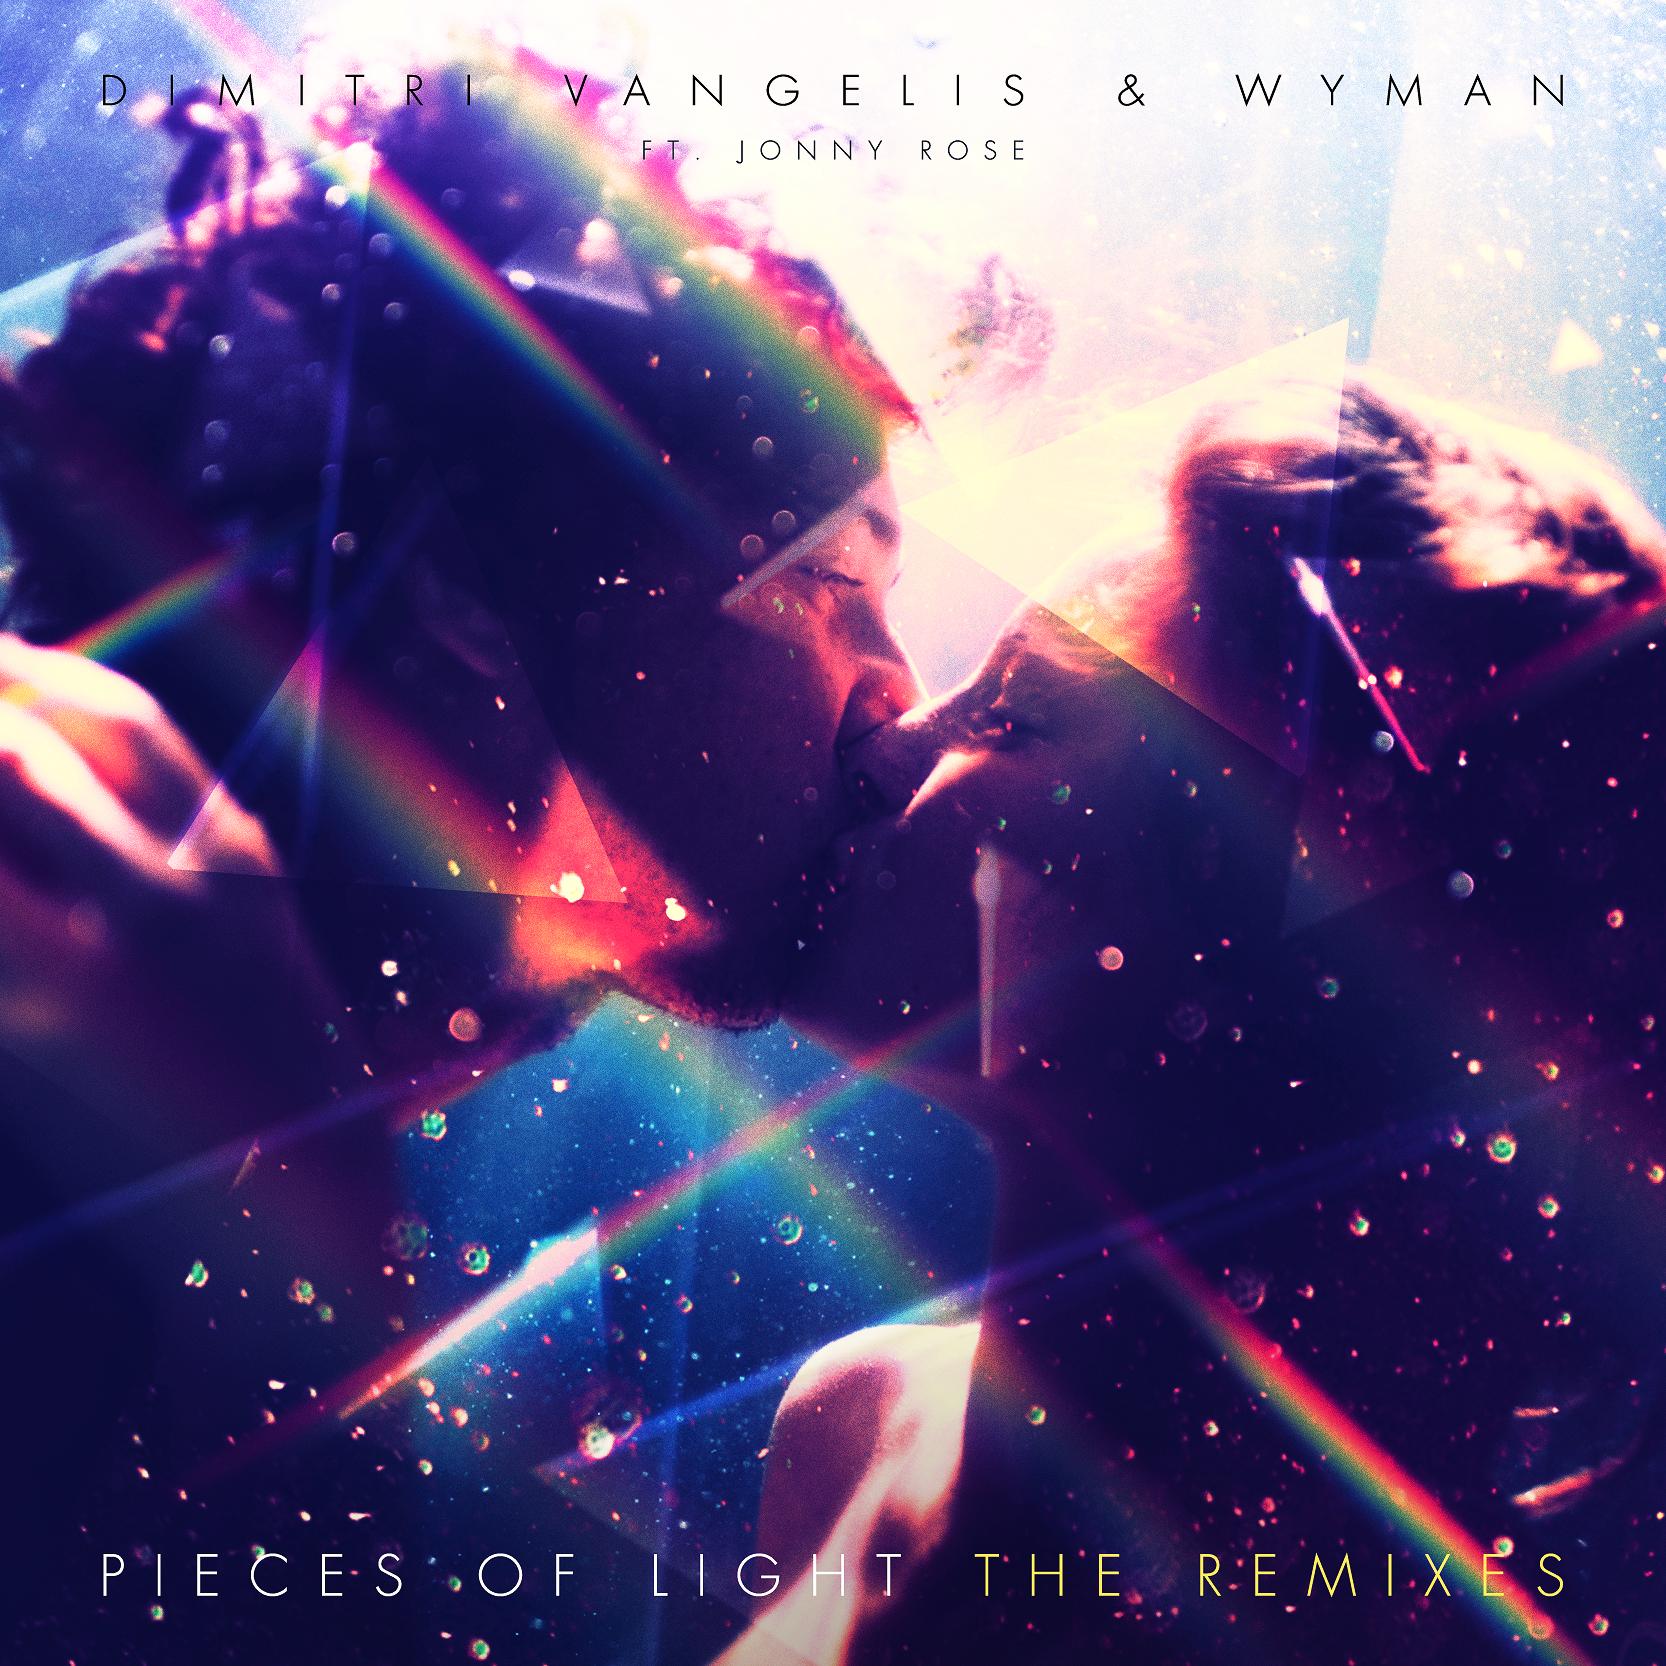 Dimitri Vangelis & Wyman ft. Jonny Rose – Pieces Of Light (The Remixes)